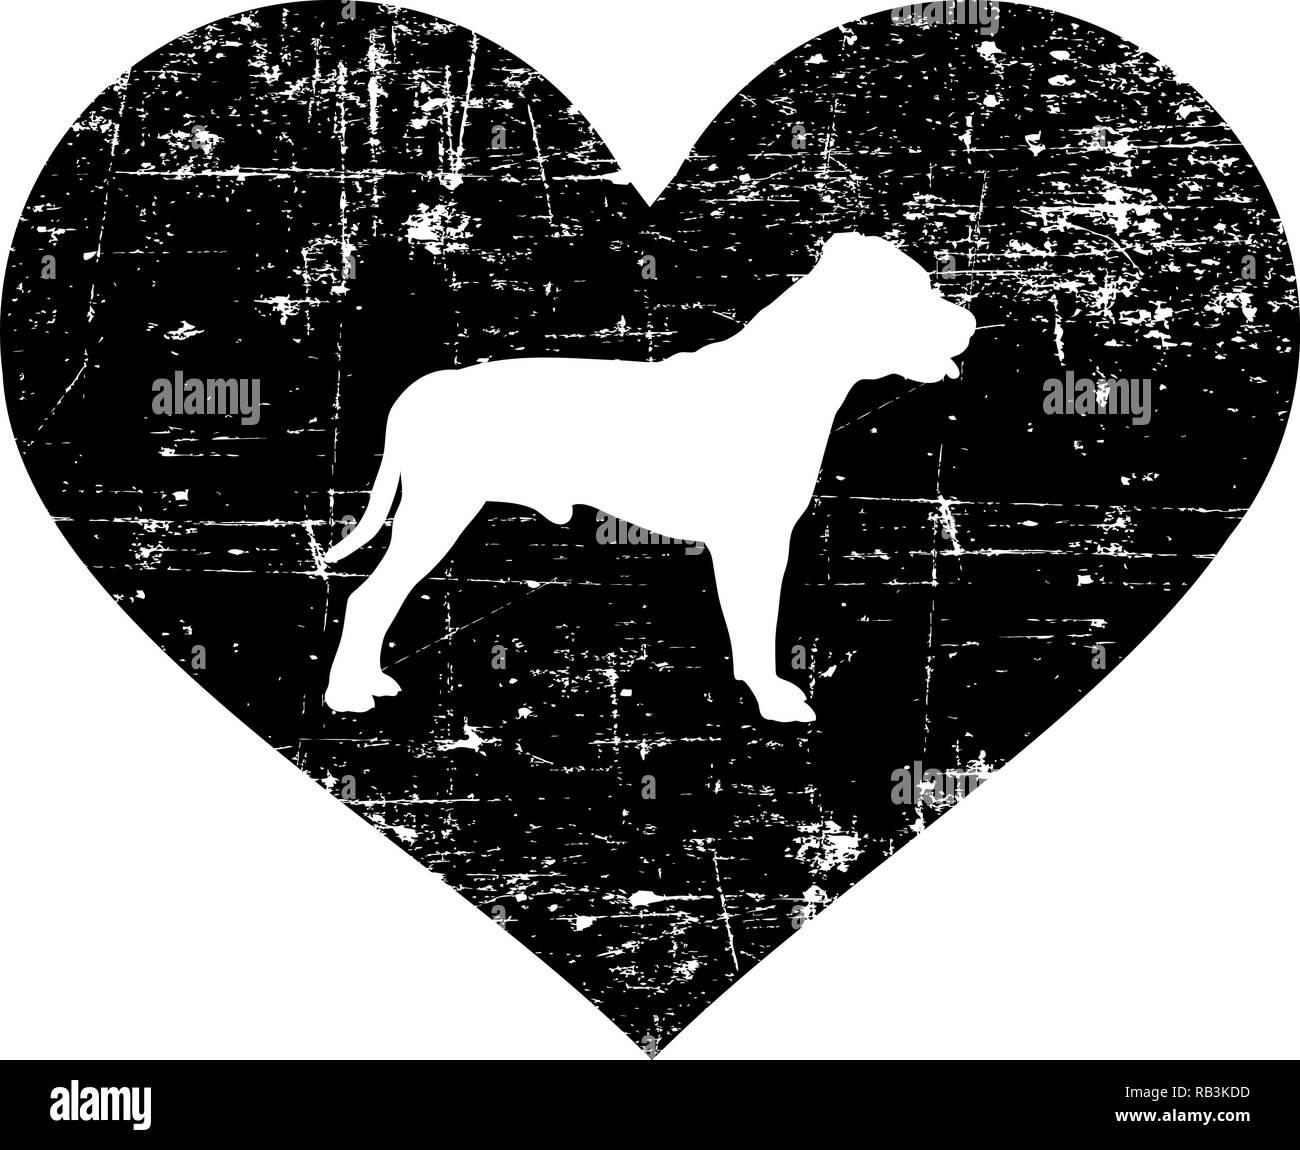 Staffordshire Bull Terrier silhouette in black heart - Stock Image